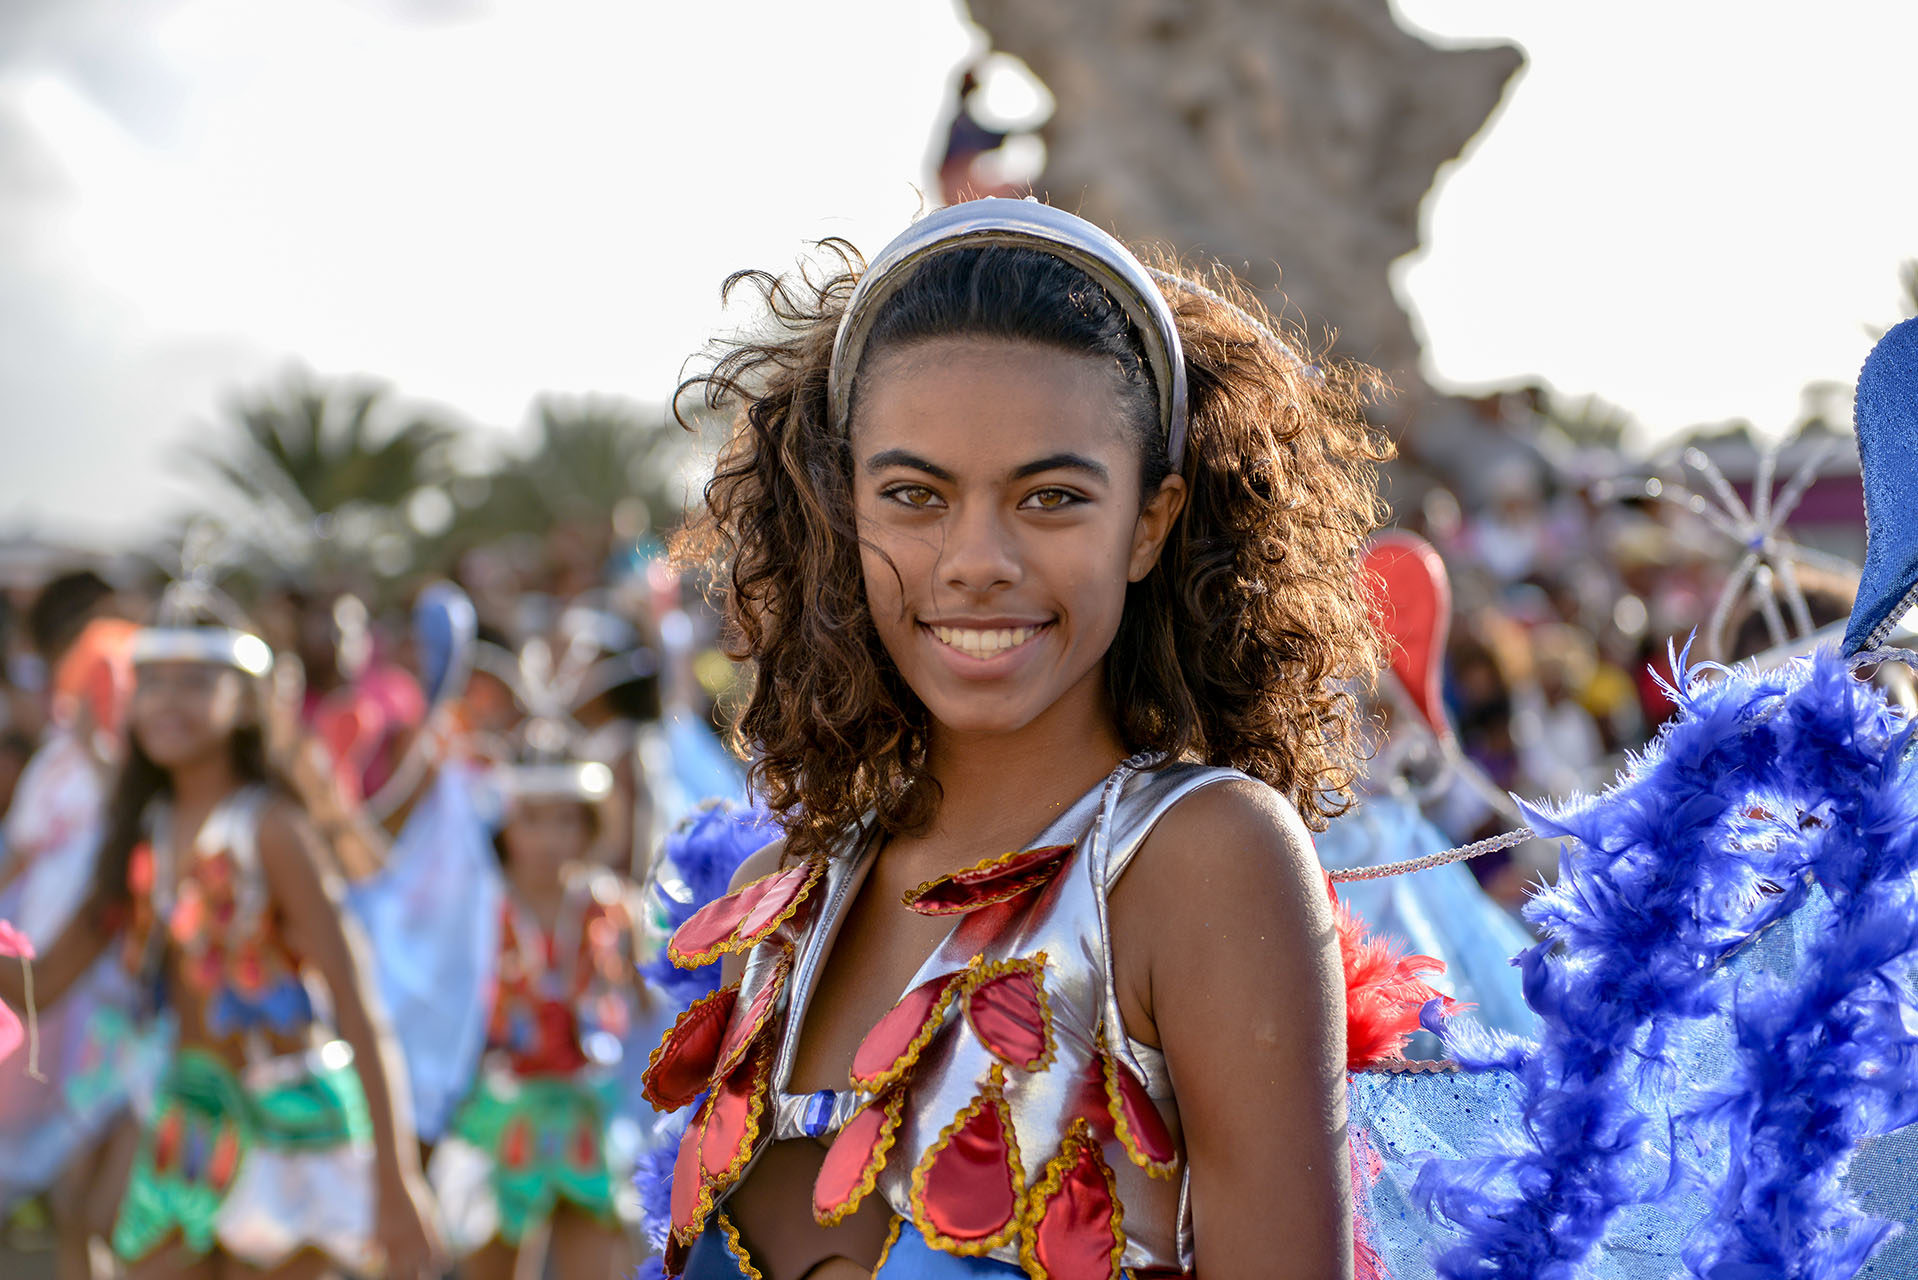 maya-angelsen-photographe-ile-de-france-evenementiel-carnaval-cap vert-mindelo